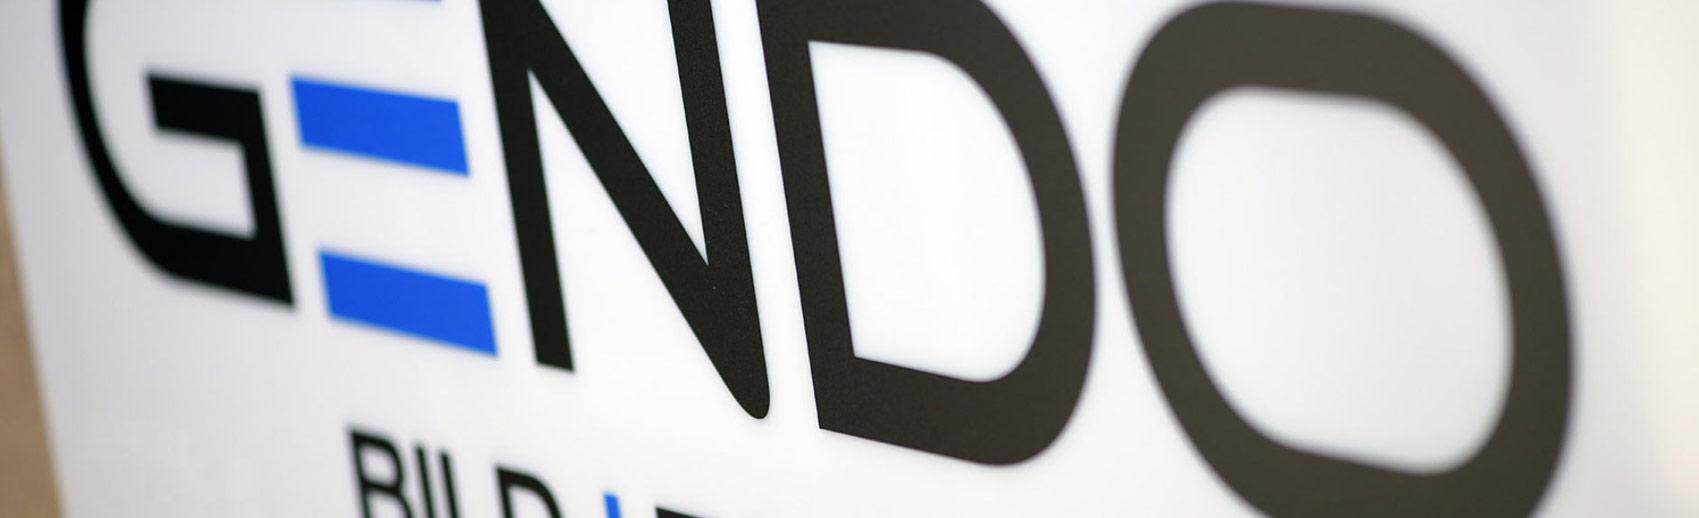 Gendo Logo - Bild | Ton | Vision